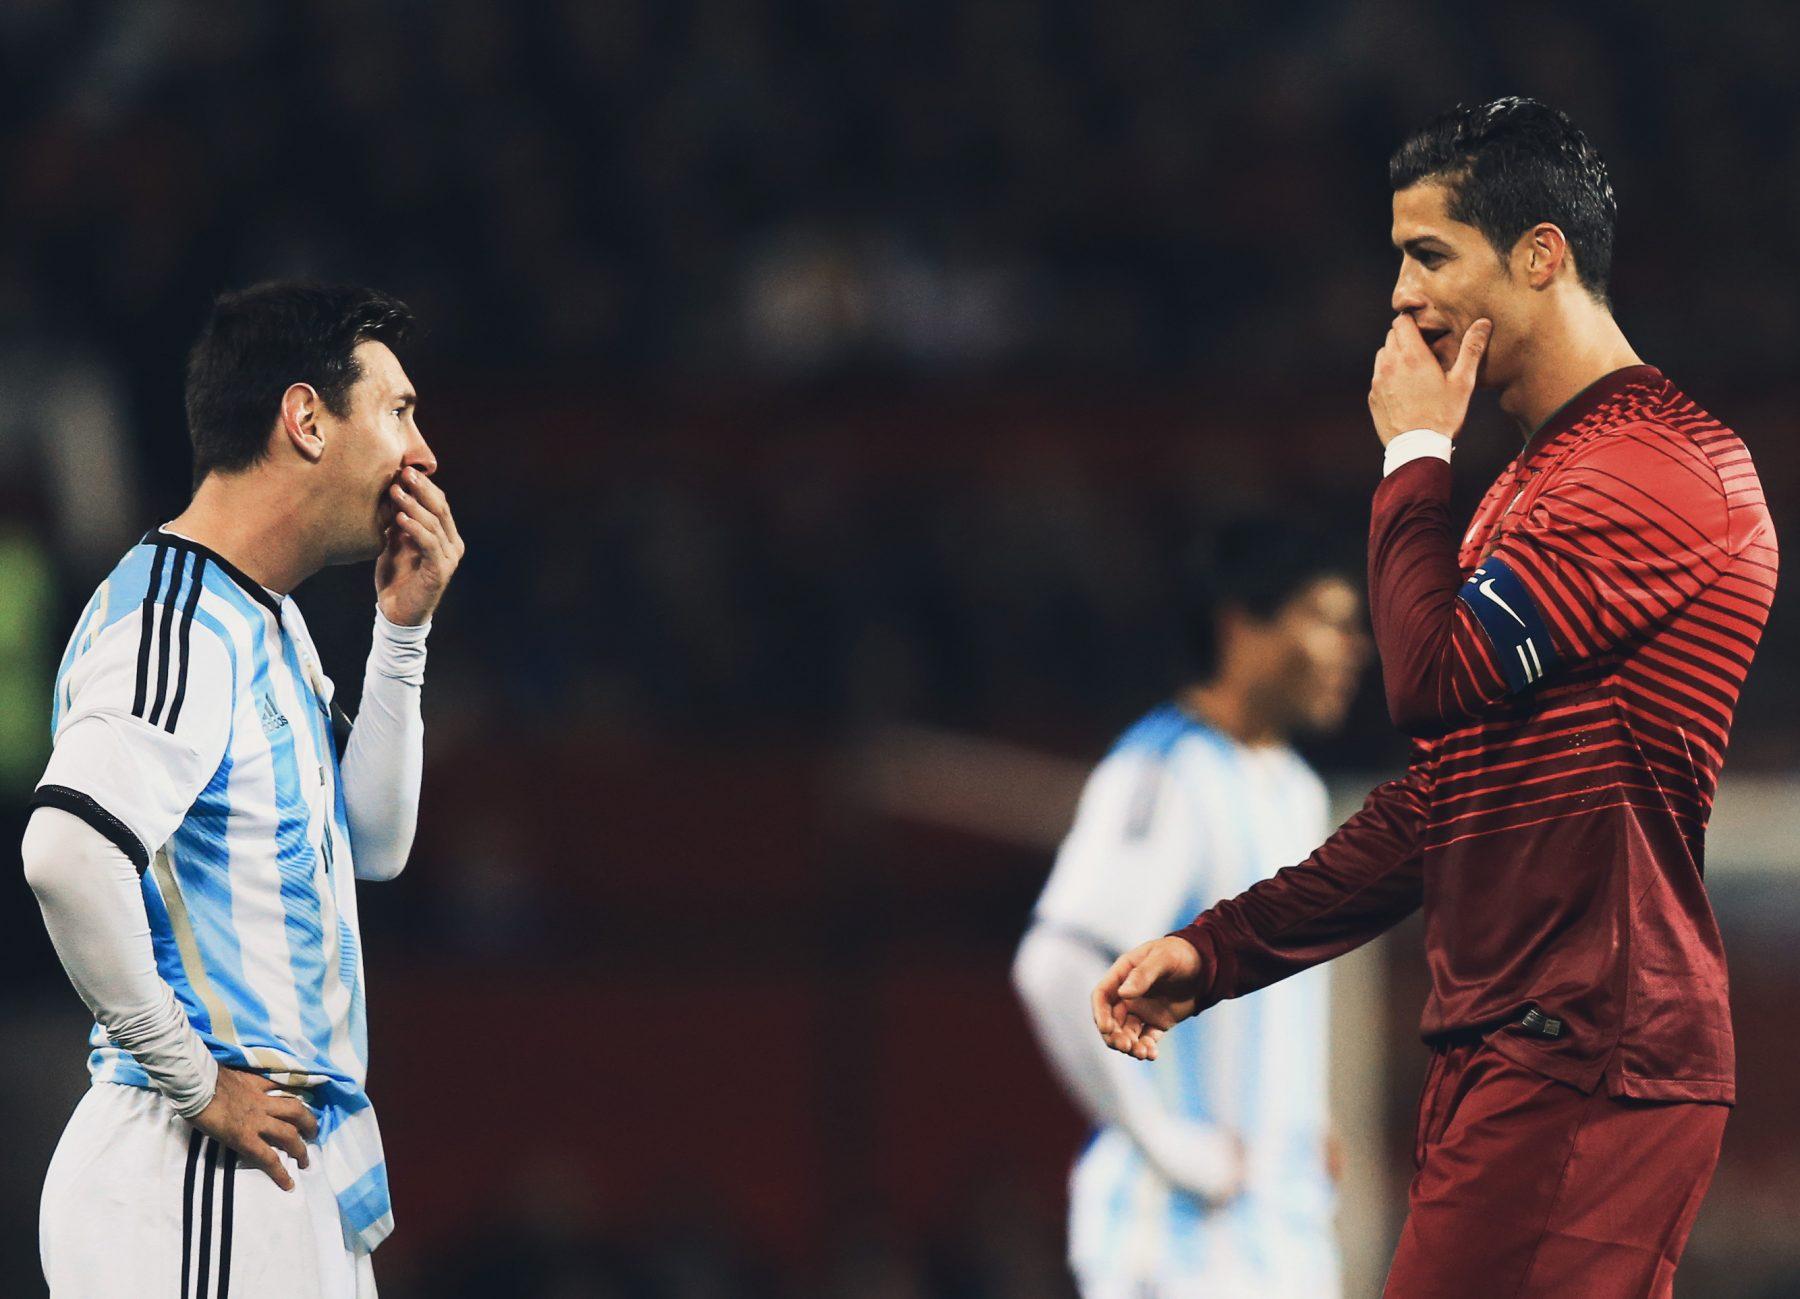 C羅:梅西讓我變更強 2人誰奪冠另一個都會被刺痛